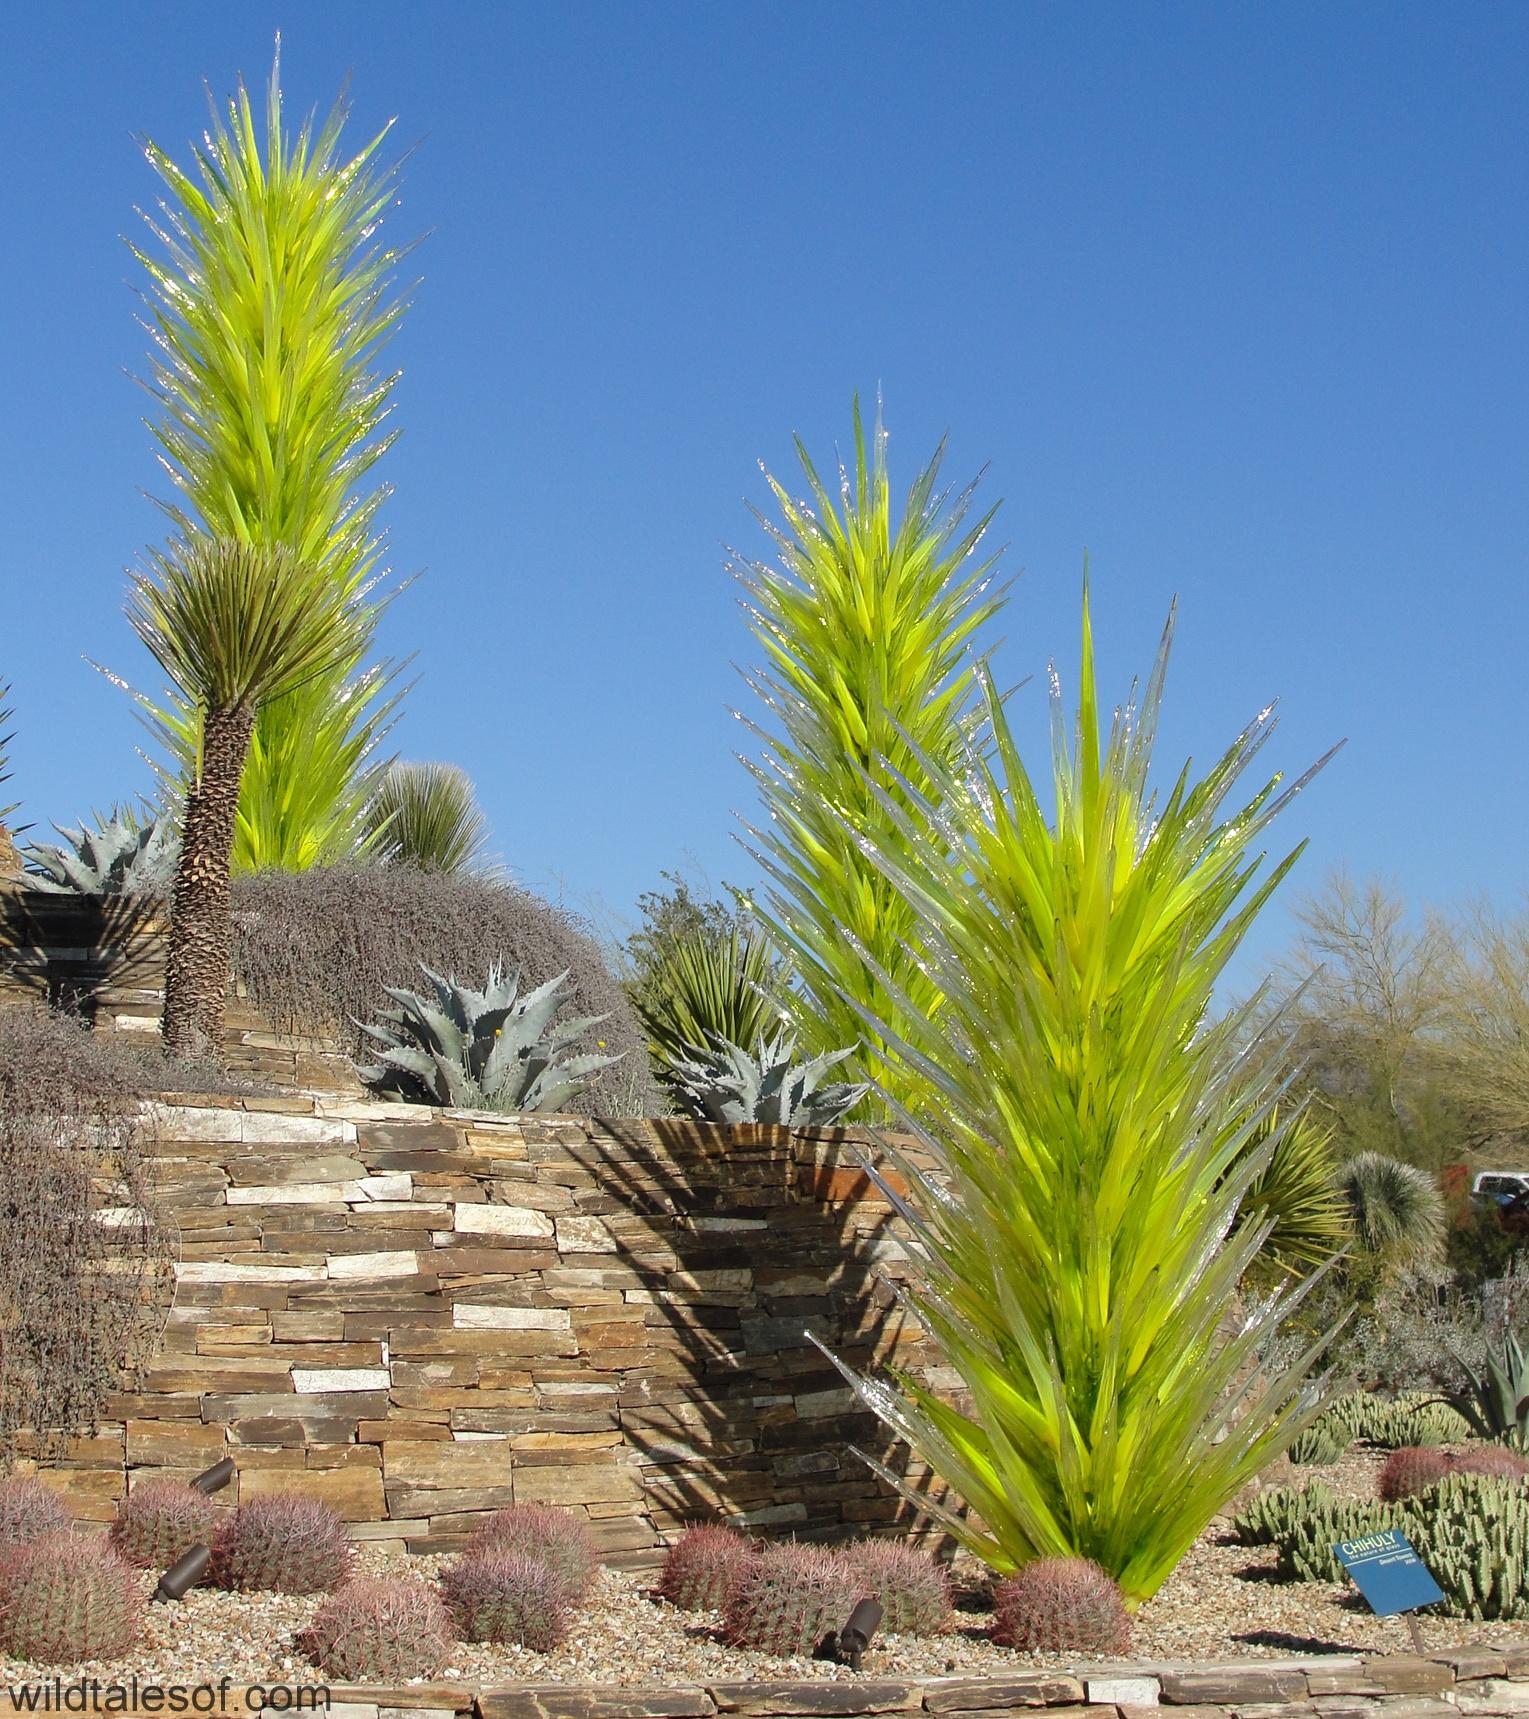 chihuly desert botanical gardens wildtalesofcom - Phoenix Desert Botanical Garden